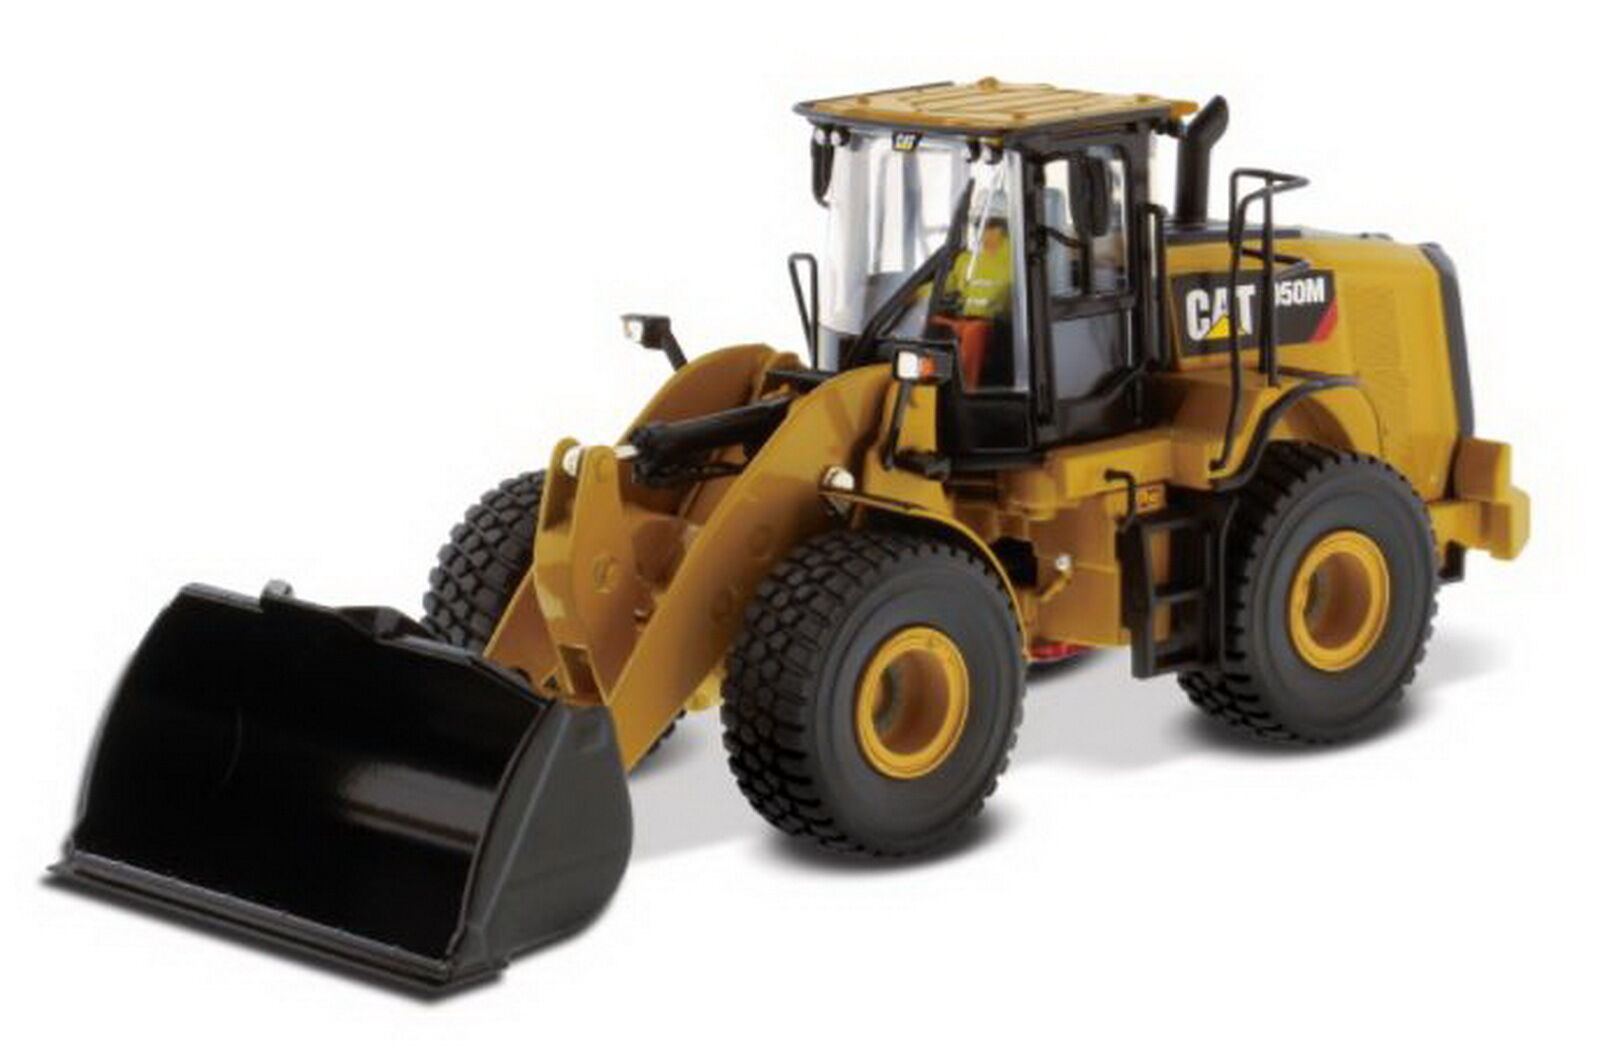 1 50 DM CATERPILLAR CAT 950 M Wheel Loader Diecast Model  85914